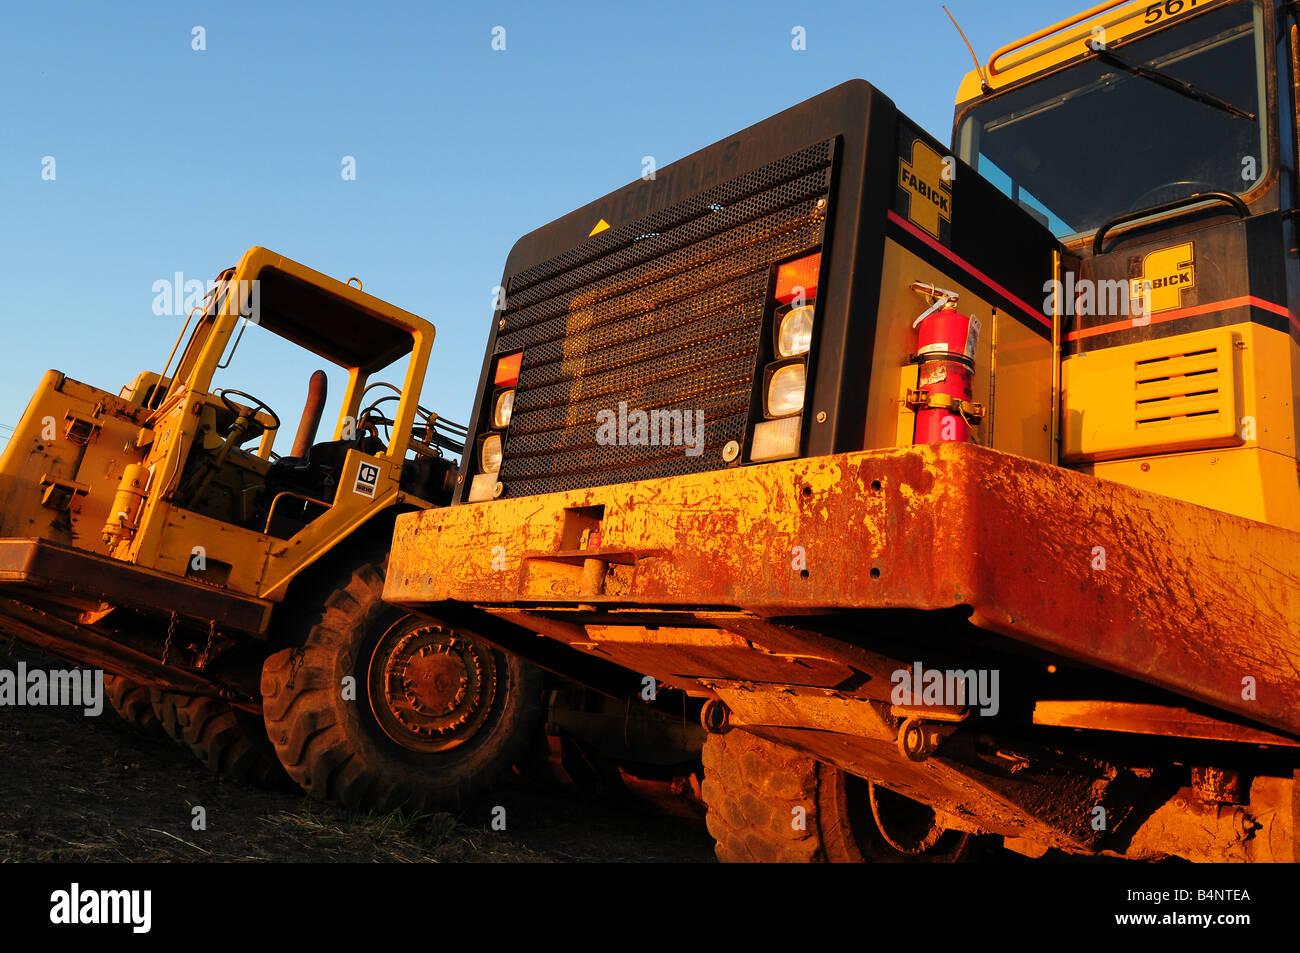 Cat or Caterpillar scraper earth mover - Stock Image